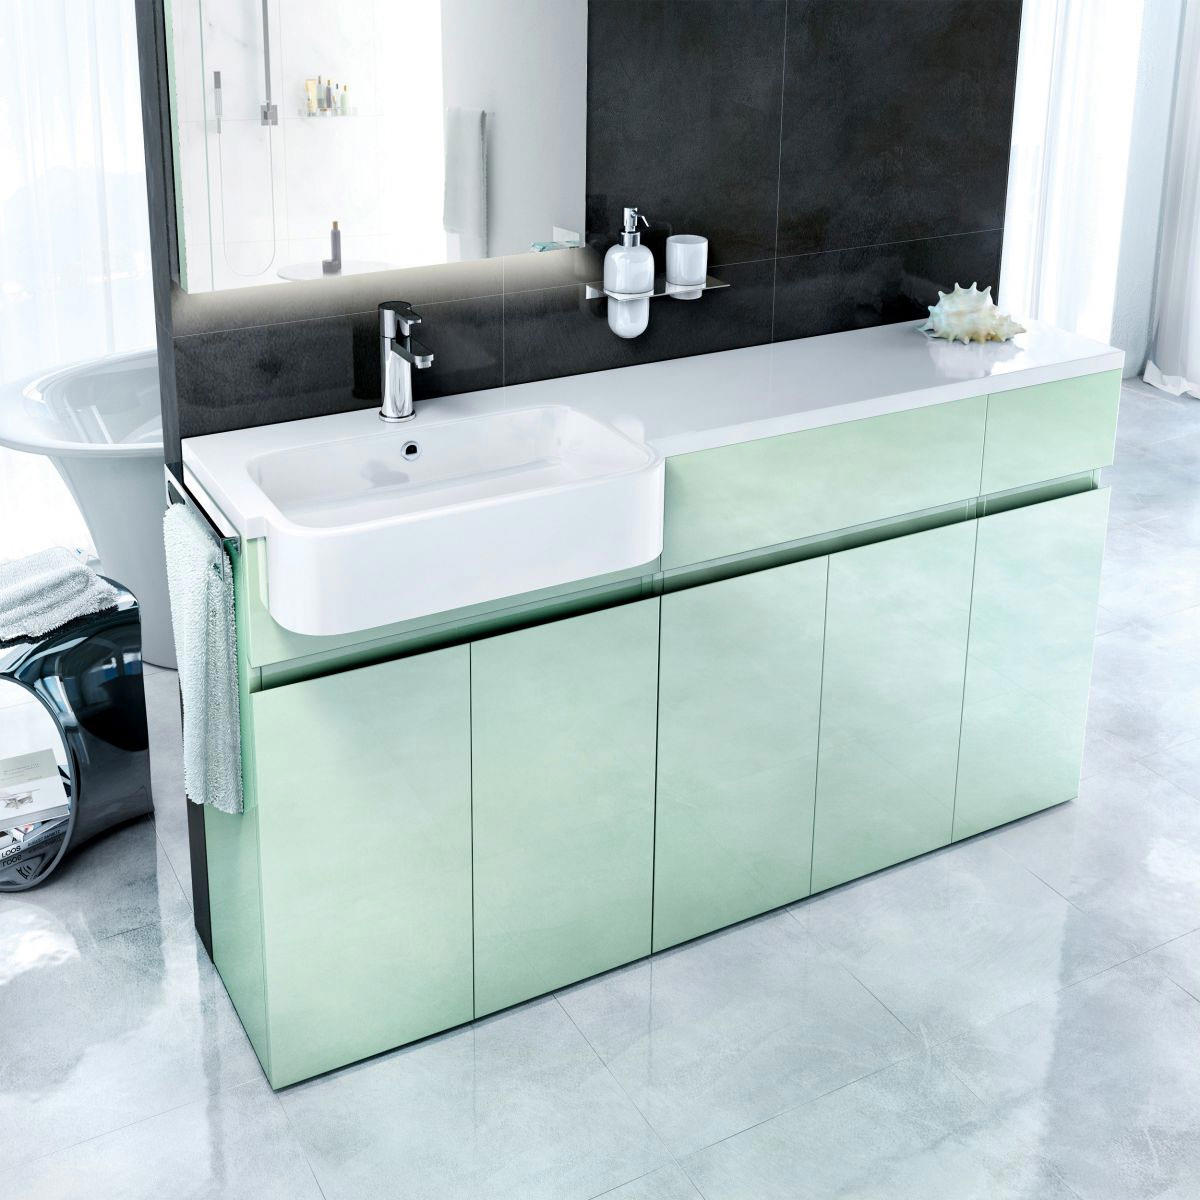 Superieur ... Additional Image Of Britton Q1230L Additional Image Of Britton Aqua  Cabinets ...